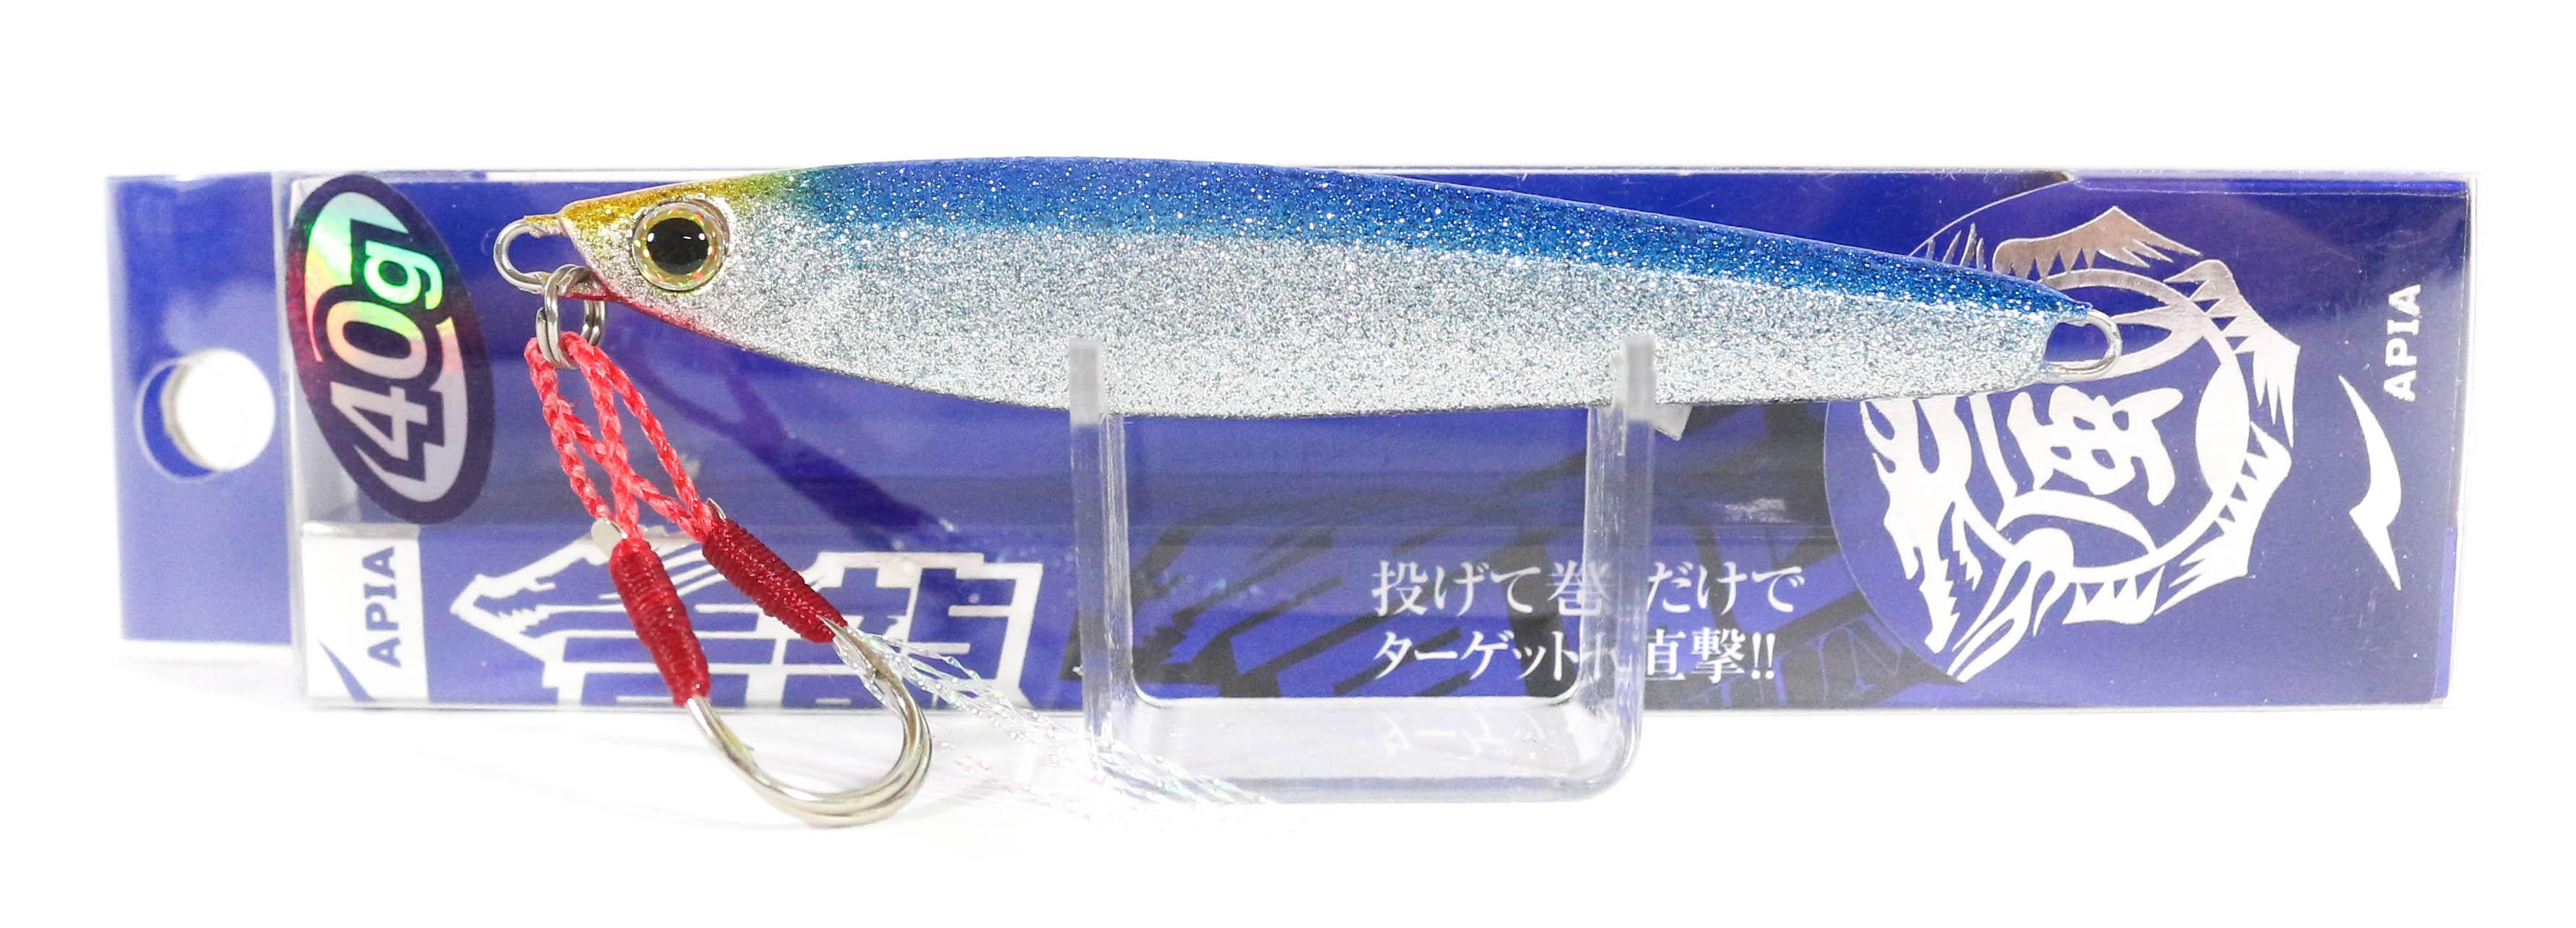 Sale Apia Metal Jig Seiryu Premium 40 grams 42 (8573)